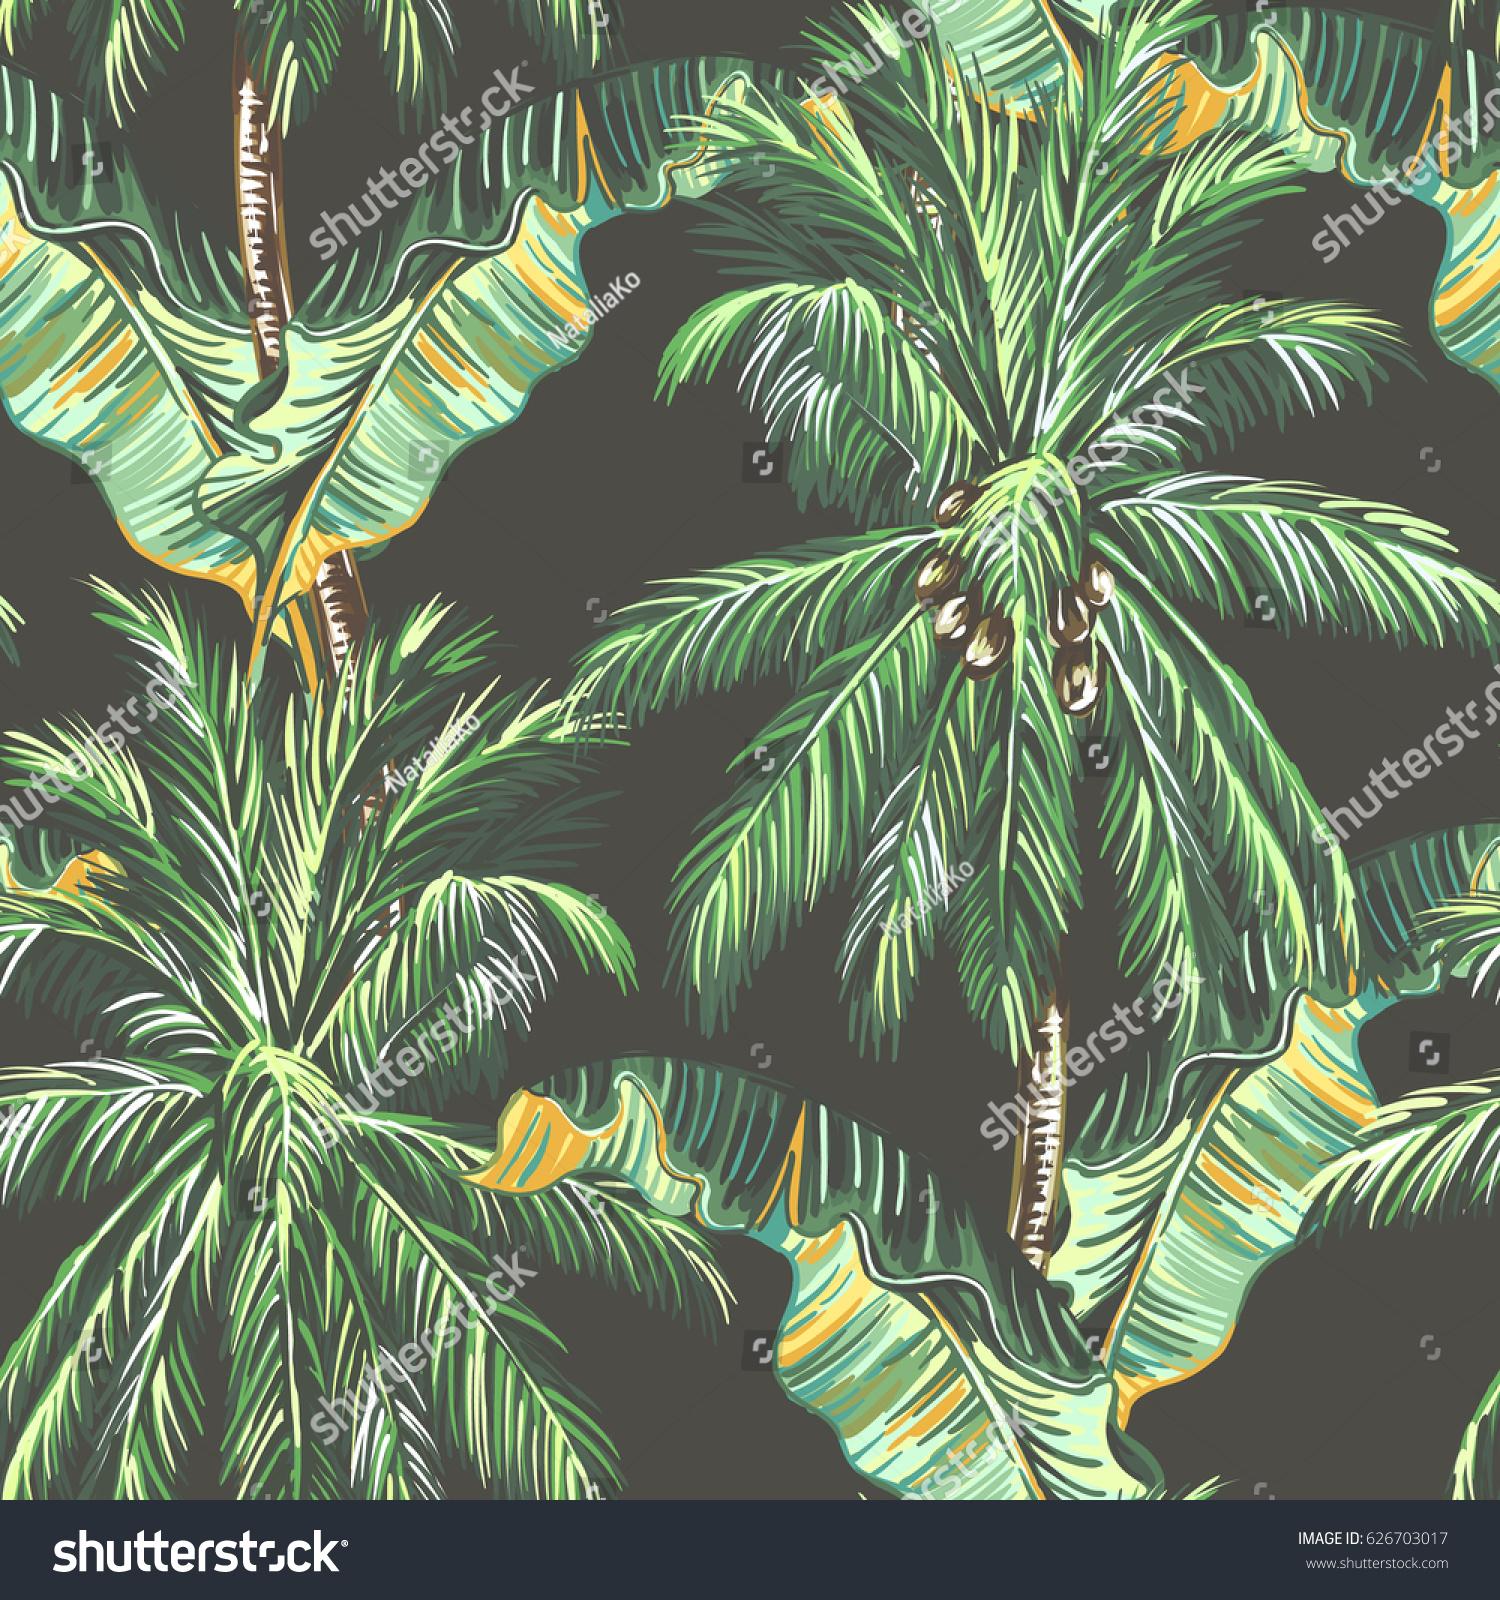 Palm Trees Tropical Leaves Banana Leaf 626703017